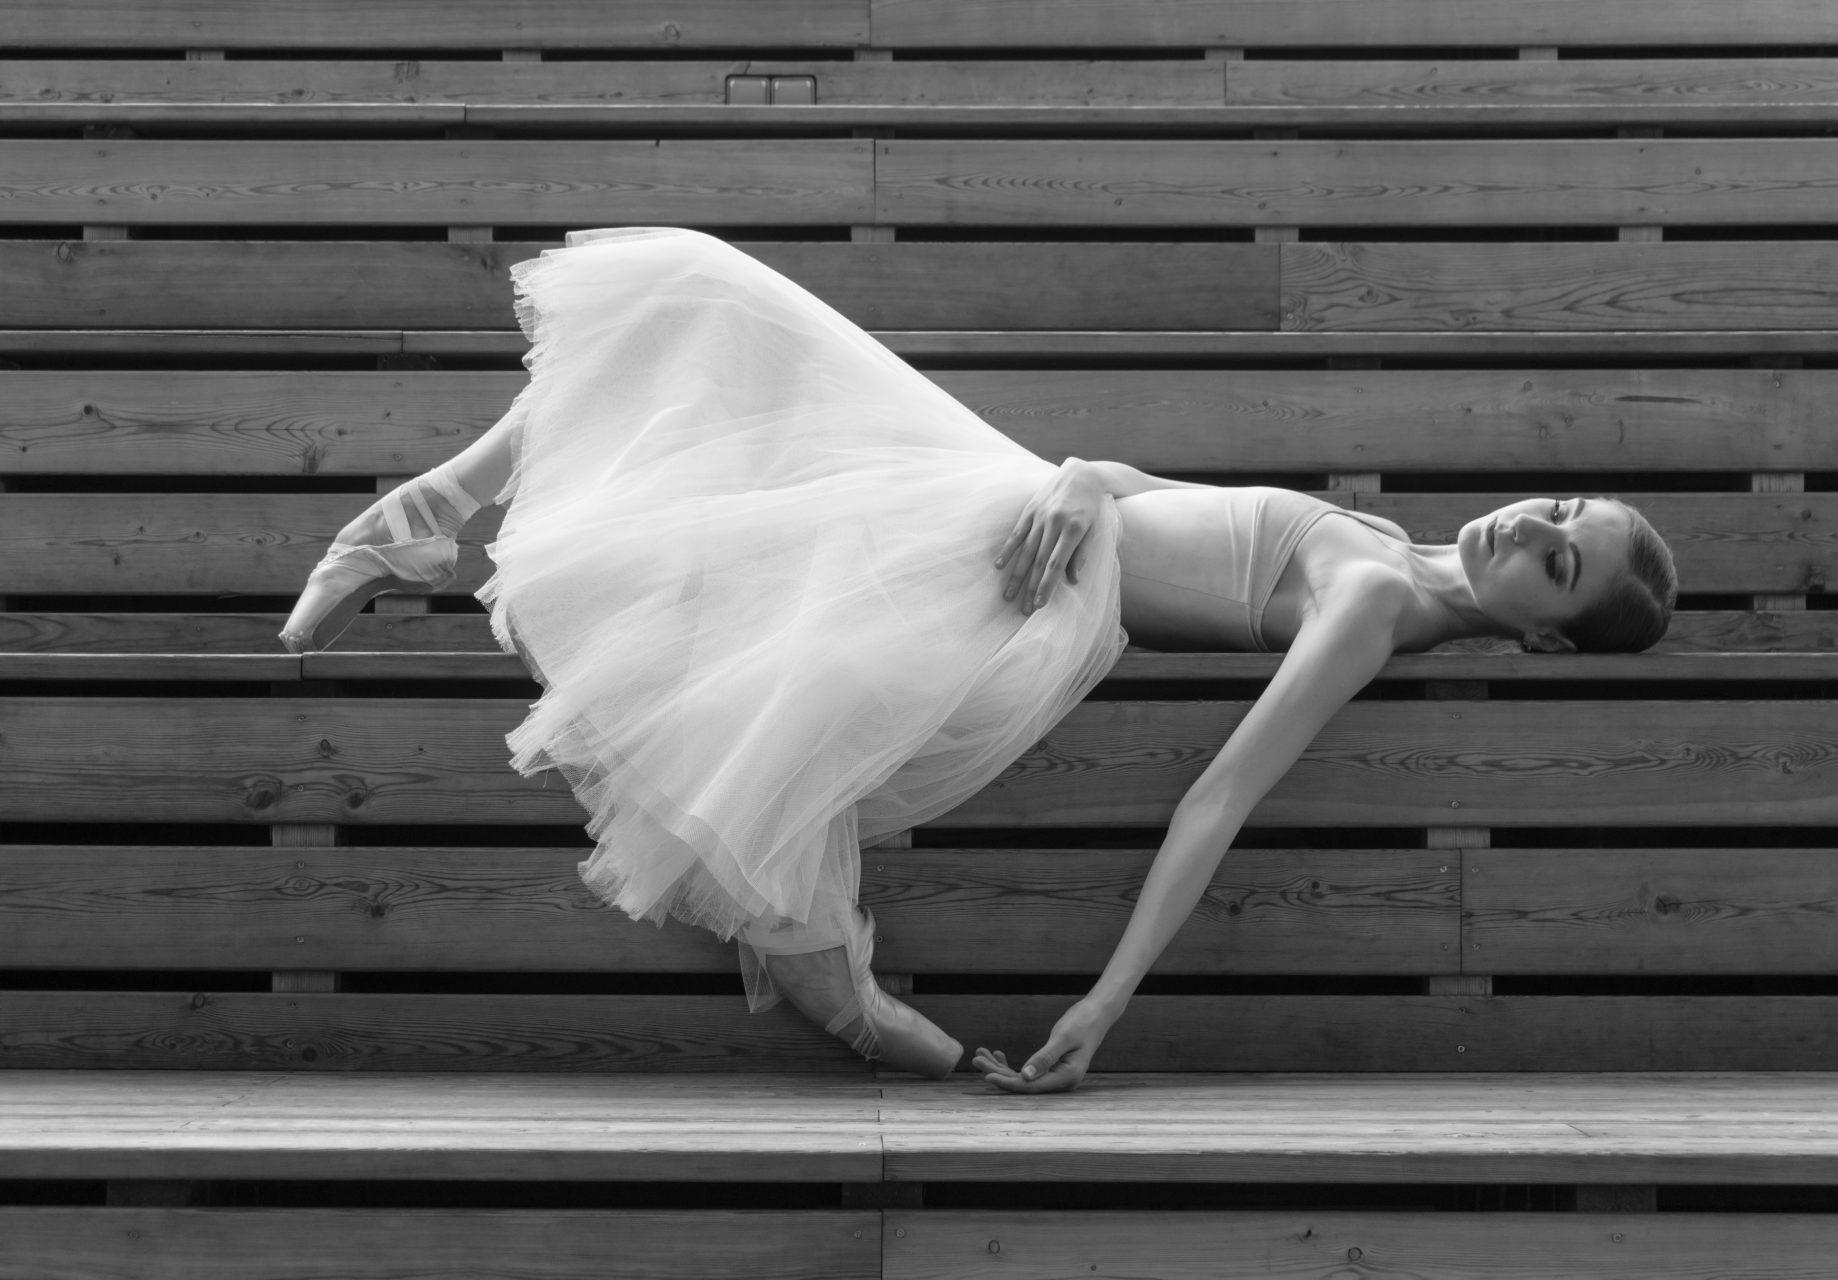 Off the stage: Татьяна Осипова